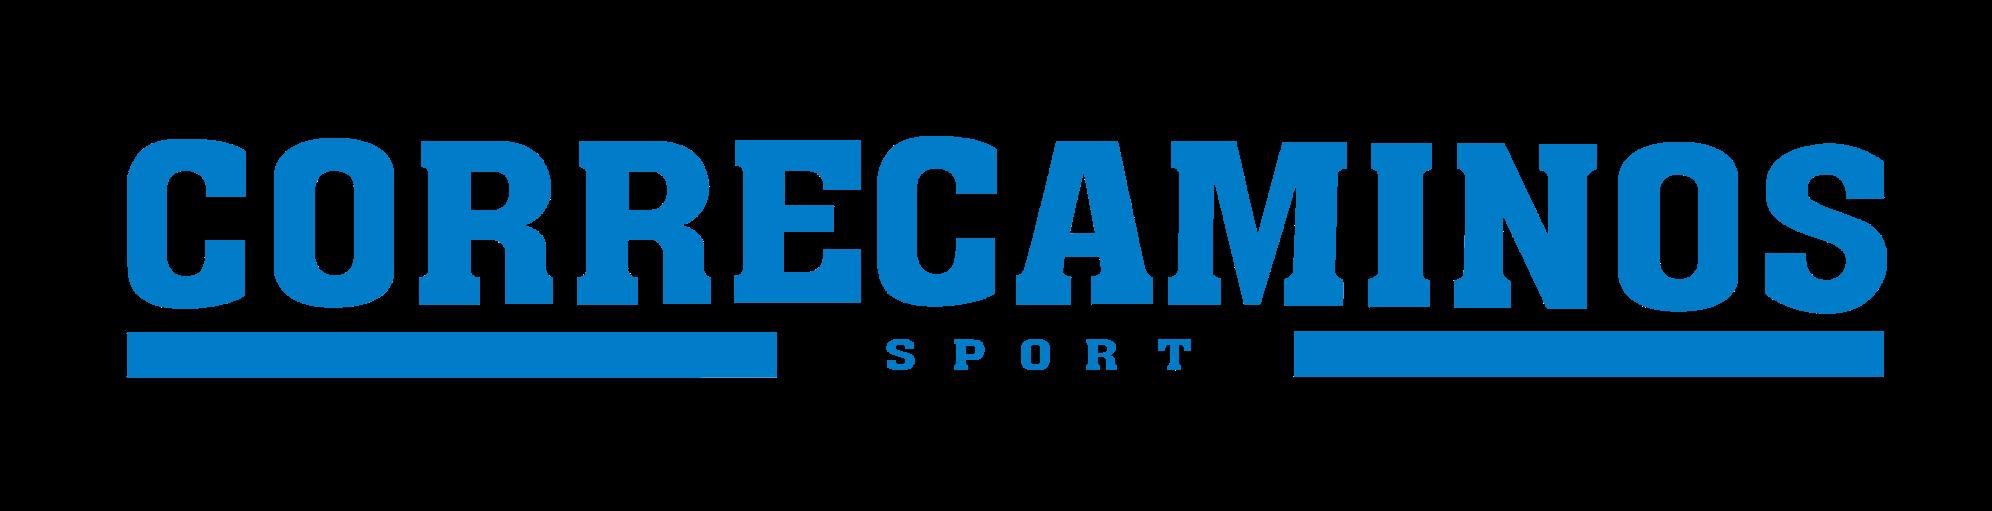 Correcaminos Sport